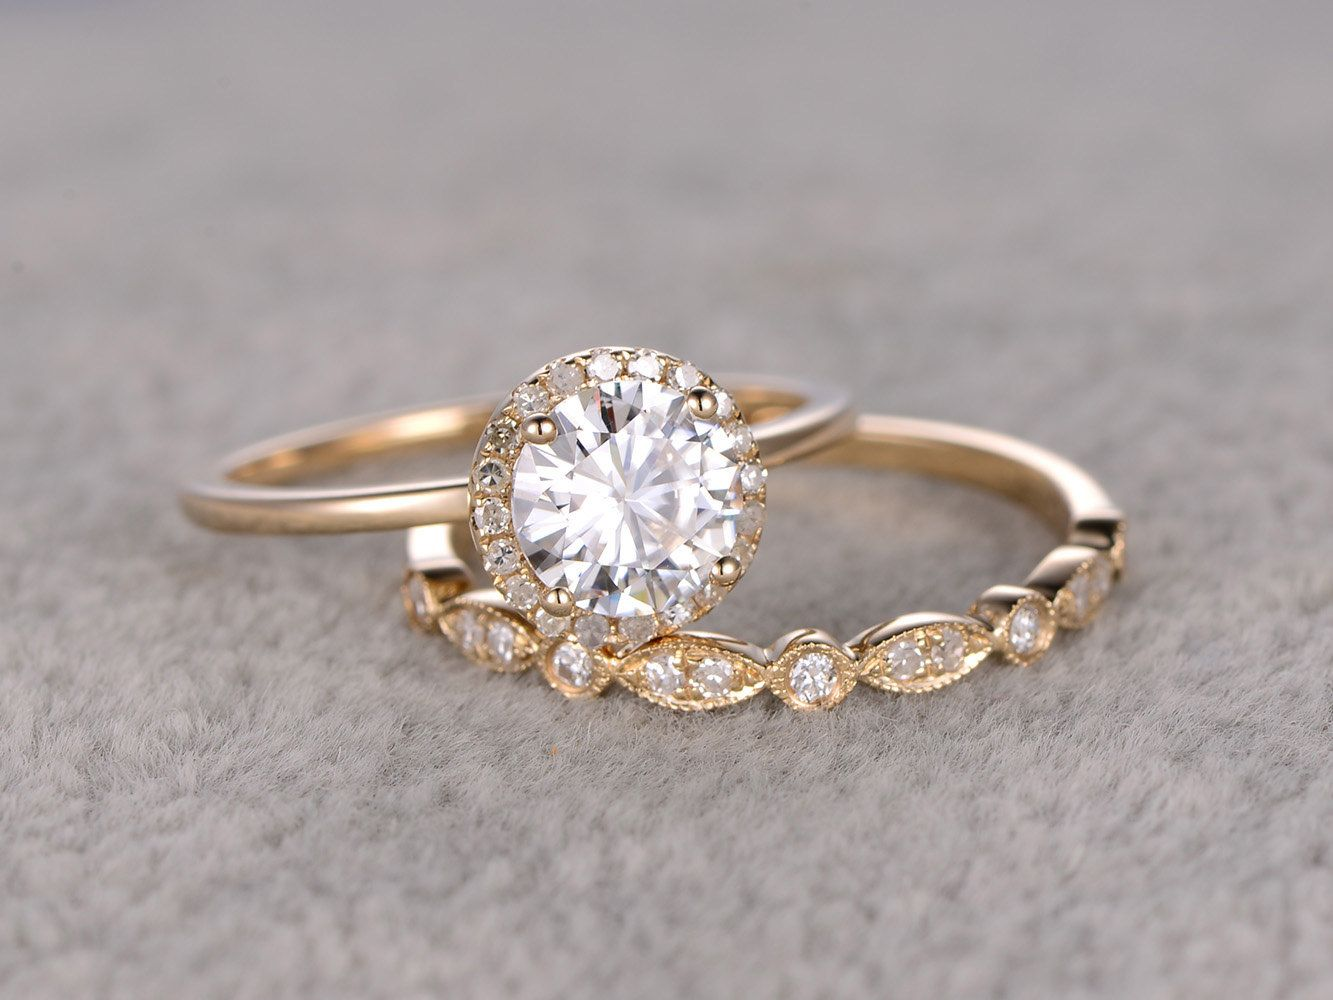 Pcs ct moissanite bridal ring setengagement ring yellow plain